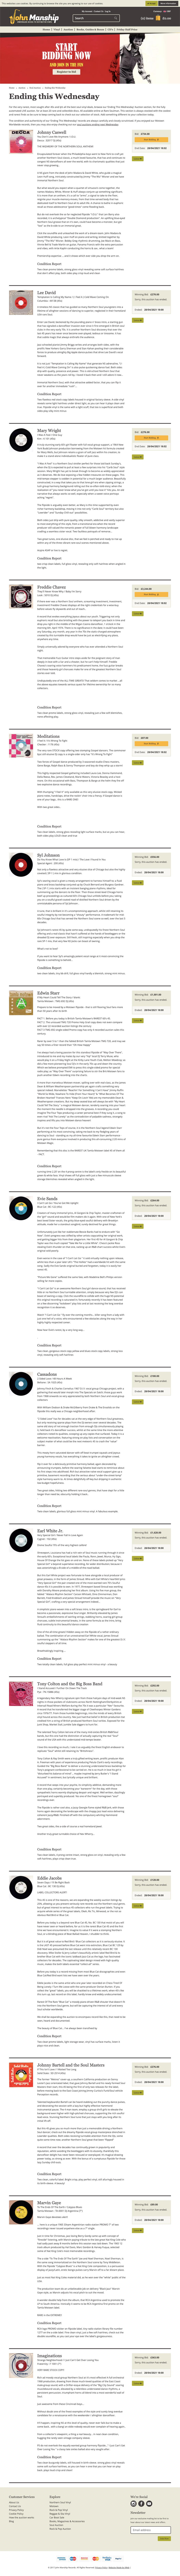 screencapture-raresoulman-co-uk-auction-soul-auction-soul-auction-ending-this-wednesday-html-2021-04-28-19_00_18.png